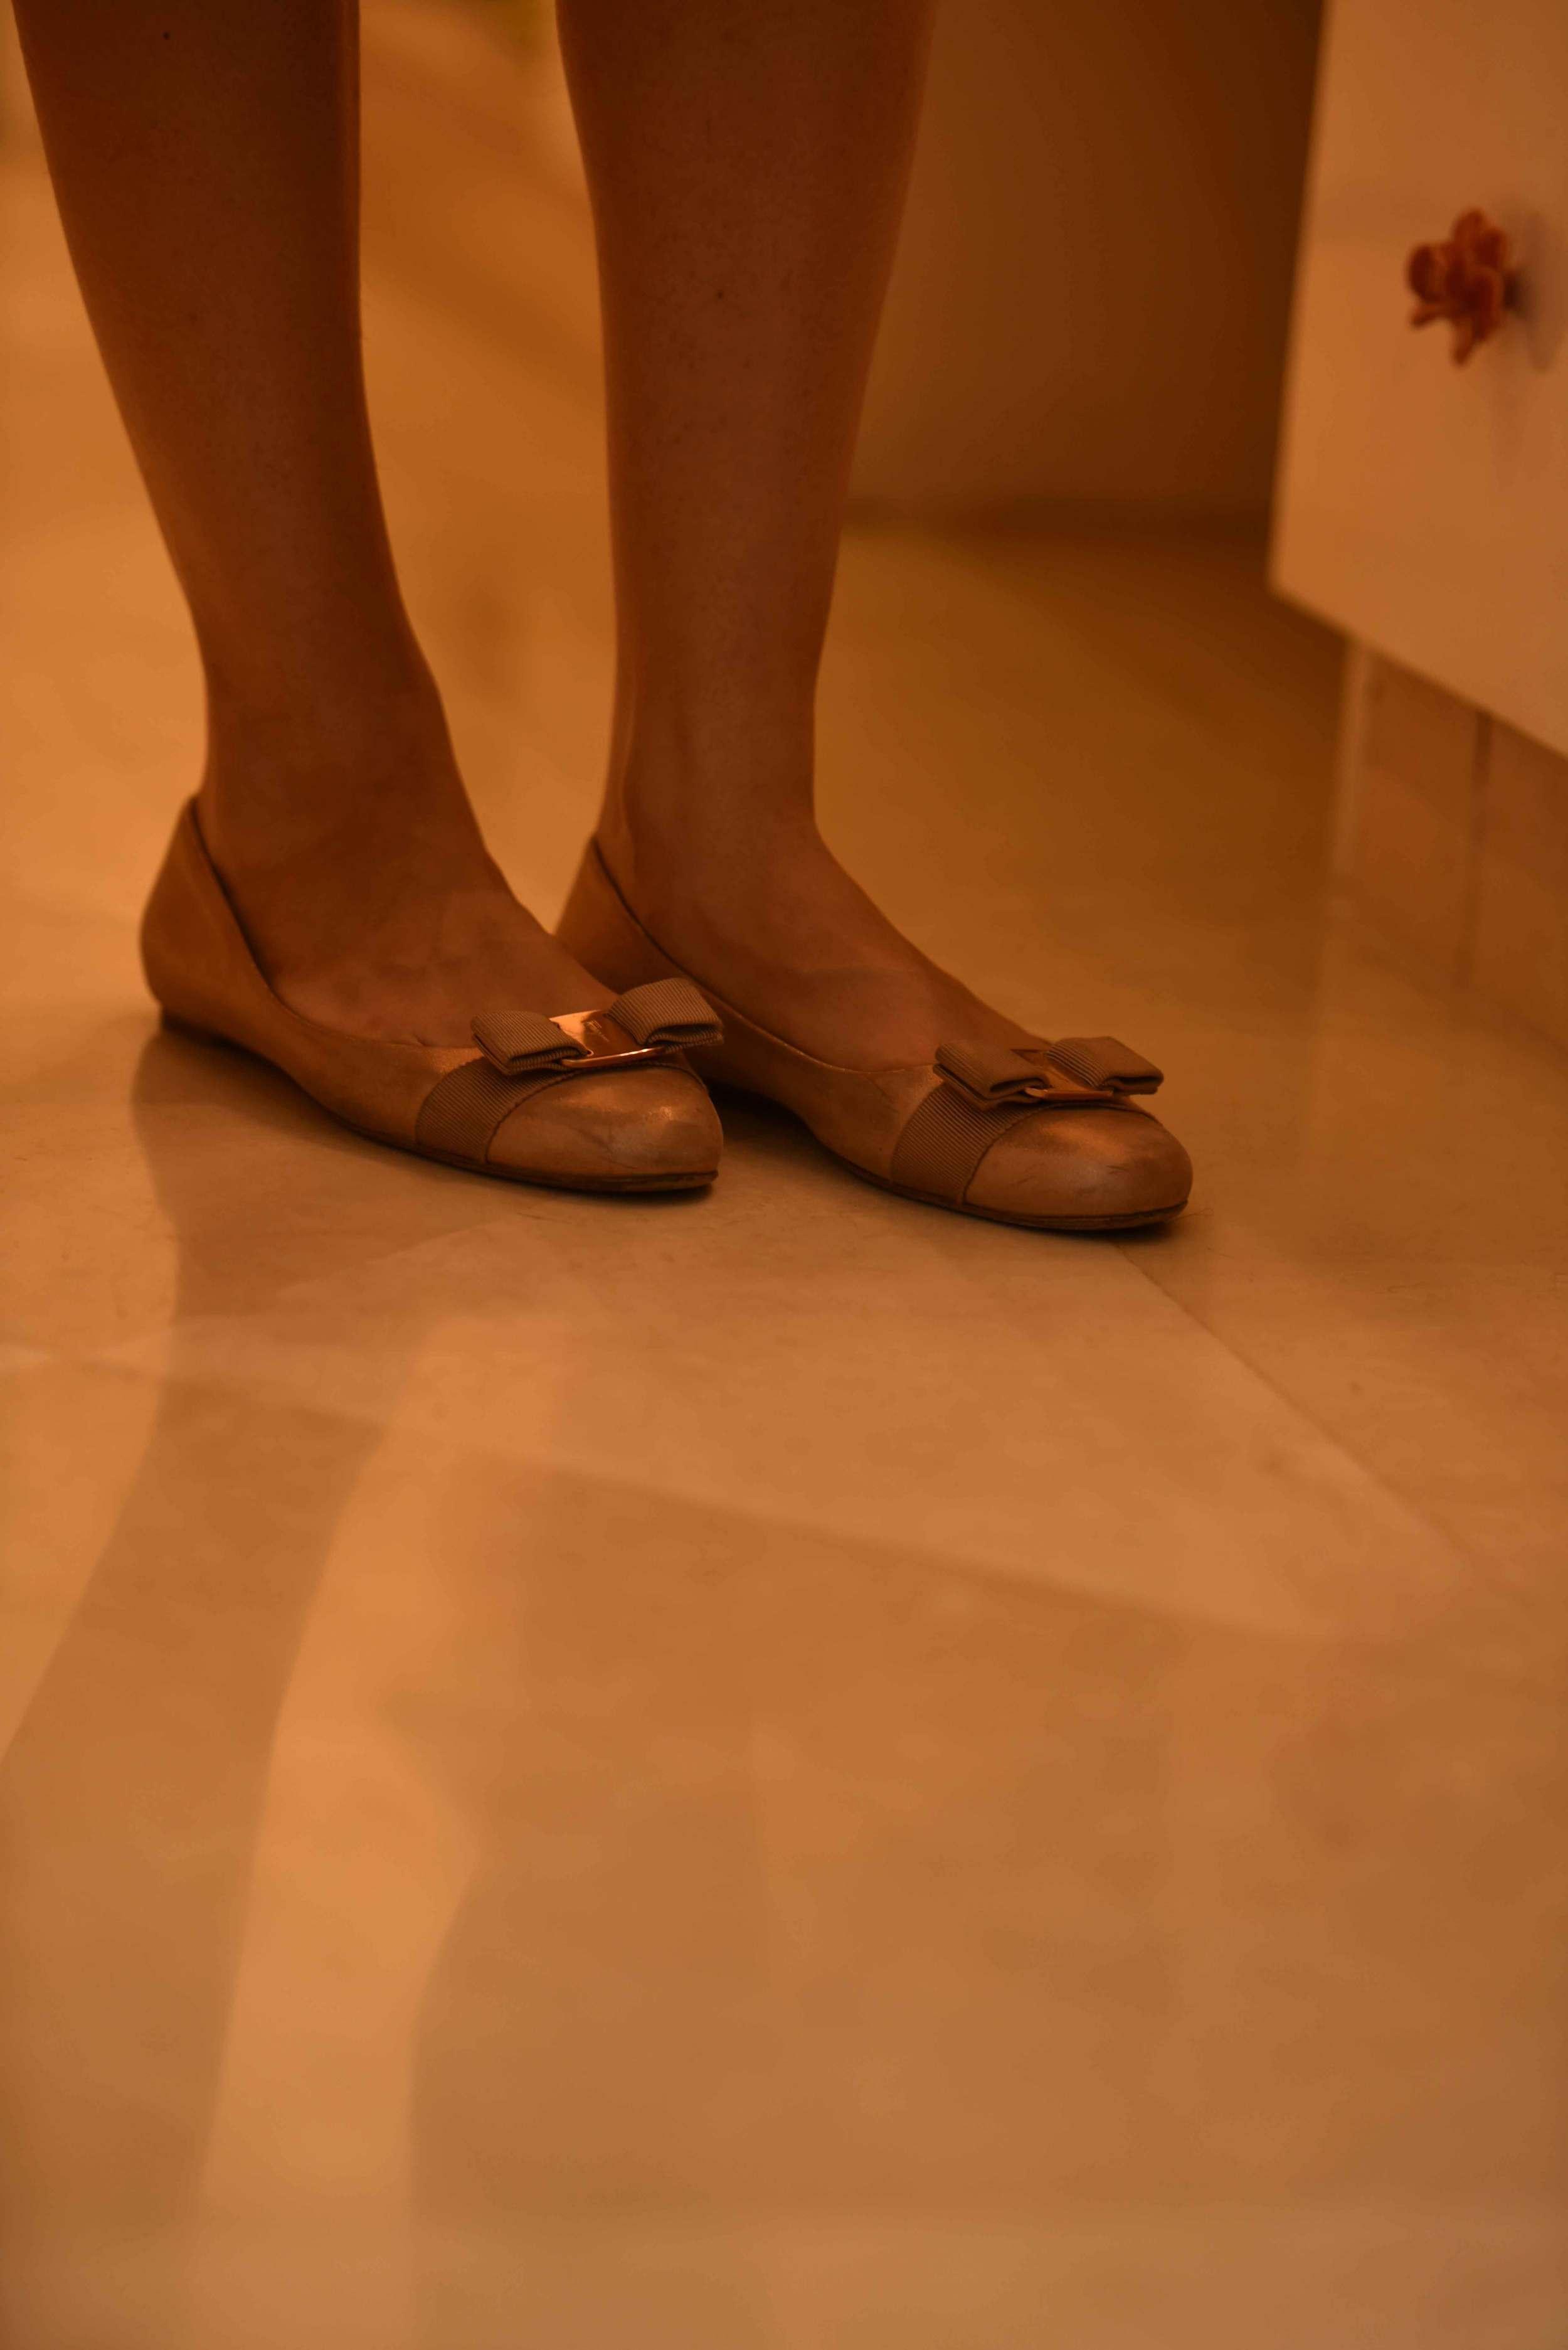 Ferragamo ballet flats. Image©gunjanvirk